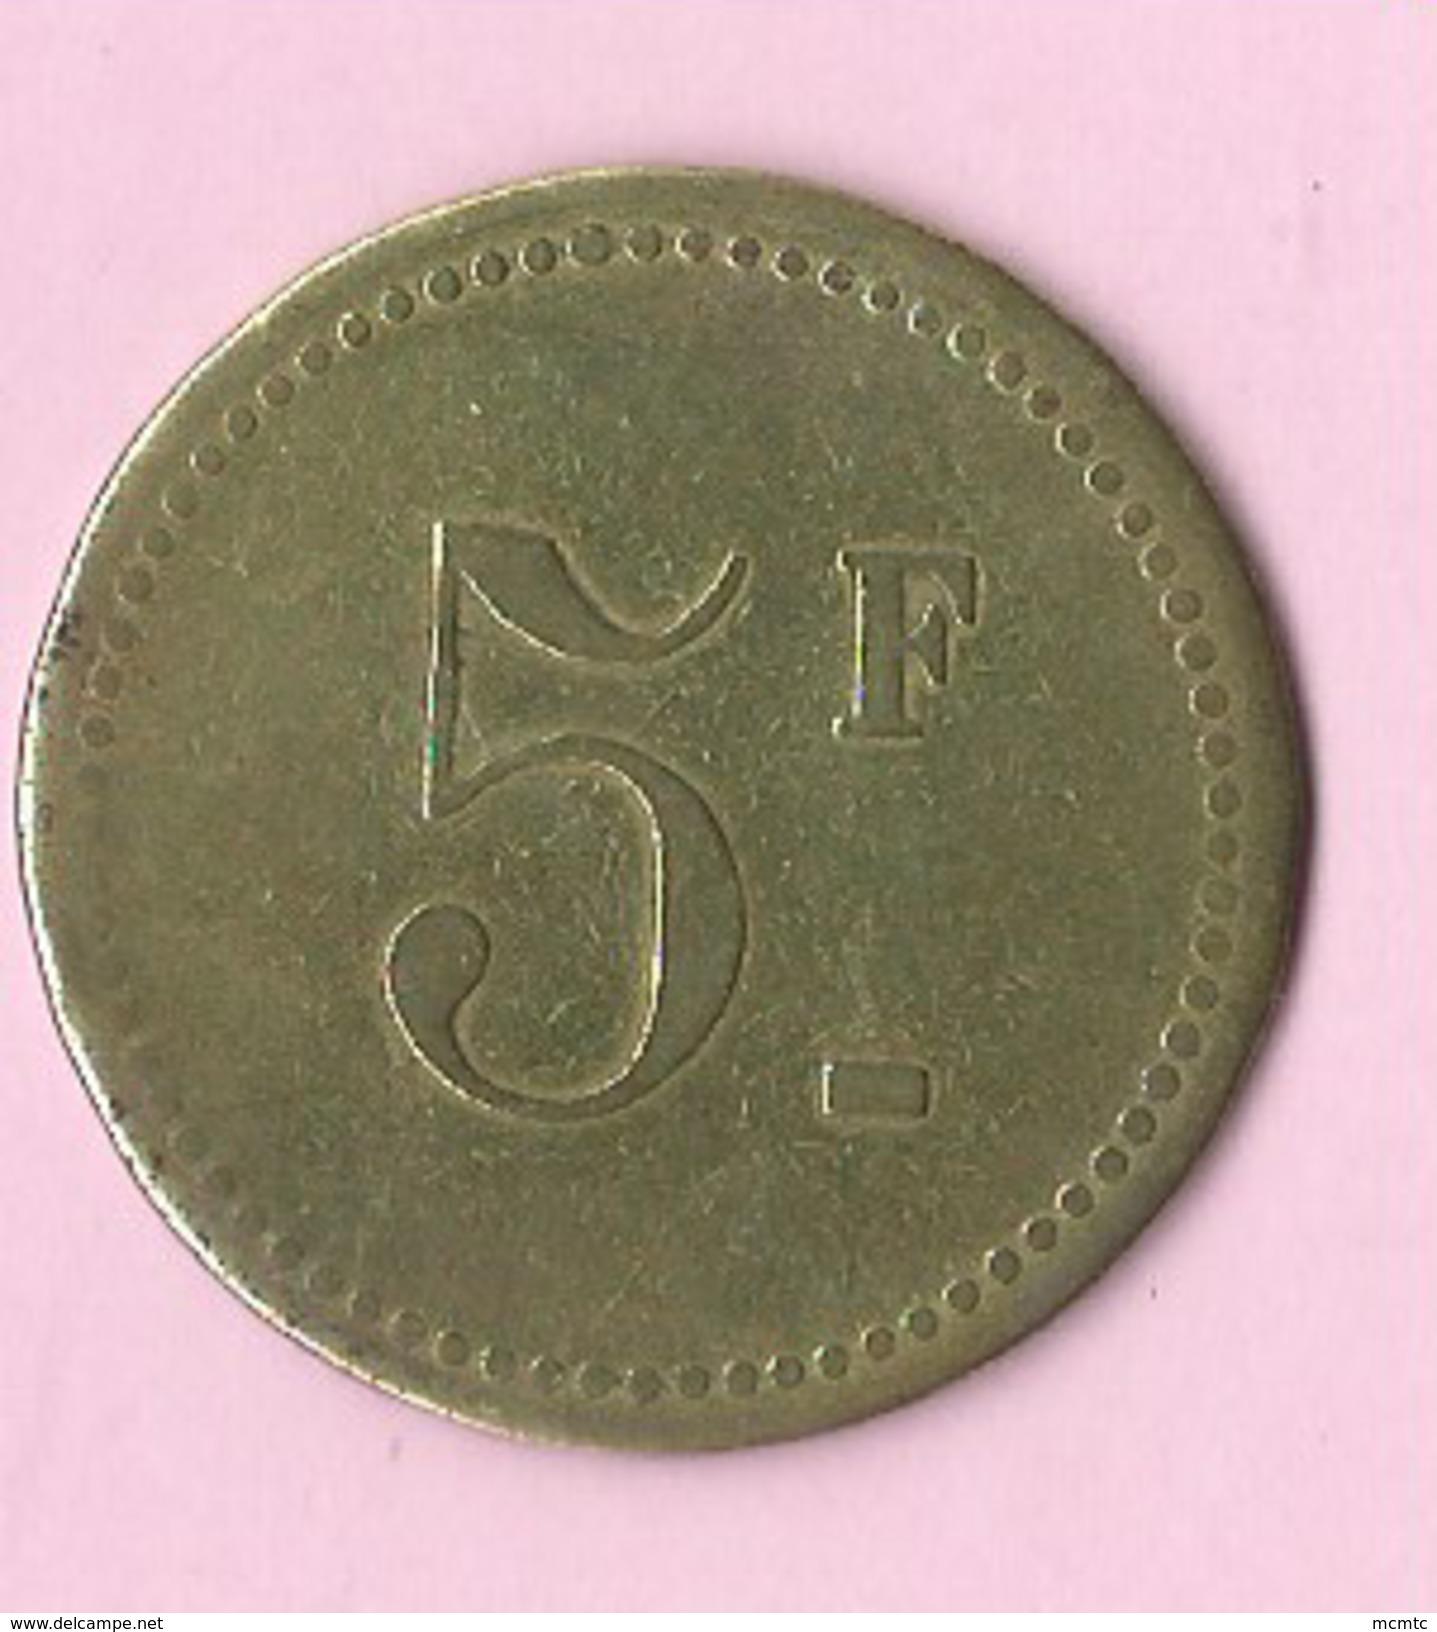 Jeton :  Recto , Verso : 5f - Jetons & Médailles